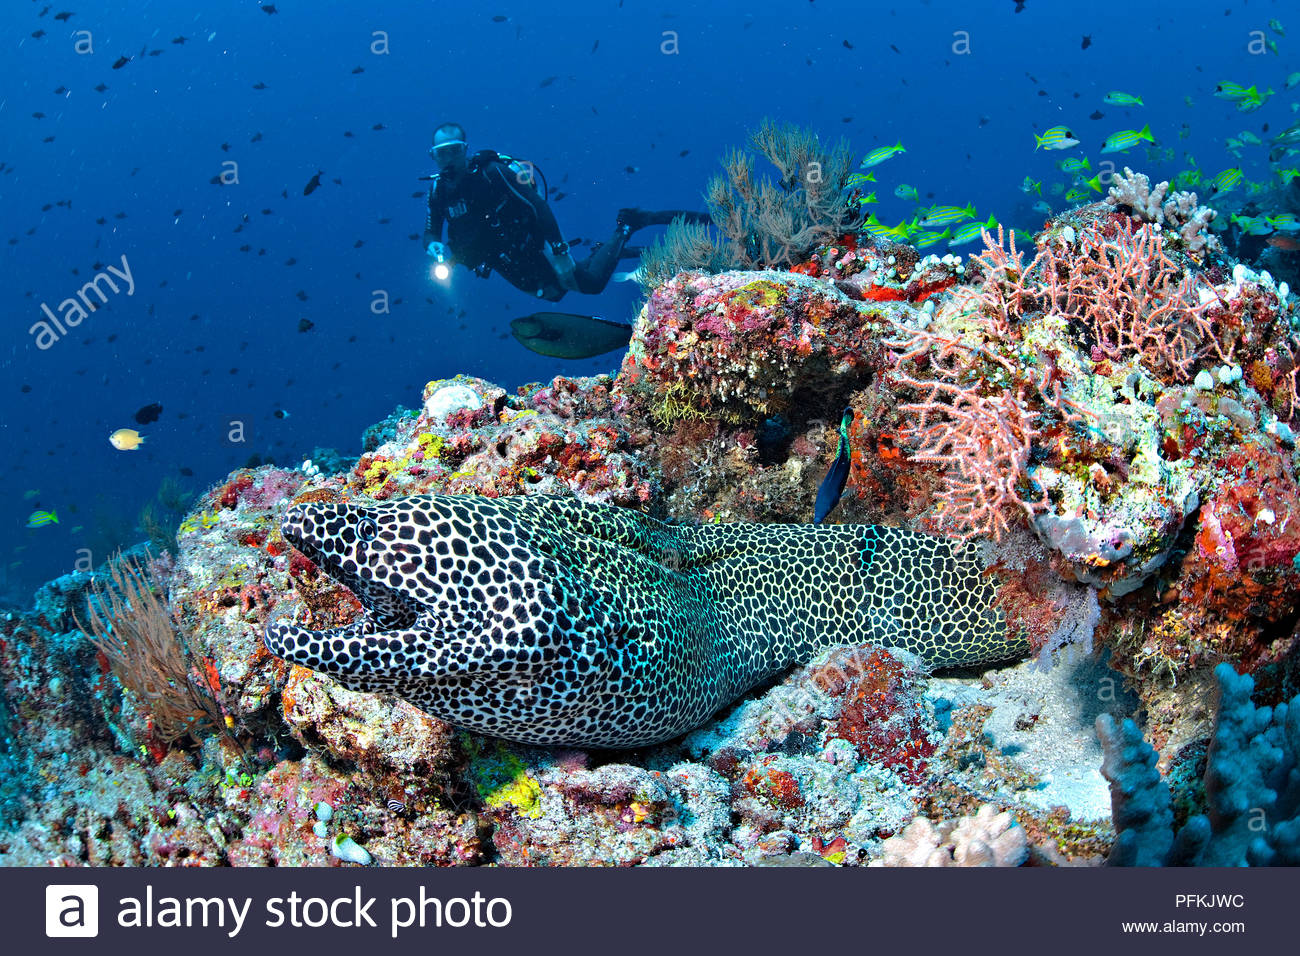 Taucher und Grosse Netzmuraene (Gymnothorax favagineus) im Korallenriff, Malediven | Scuba diver and Honeycomb moray or Laced moray (Gymnothorax favag - Stock Image